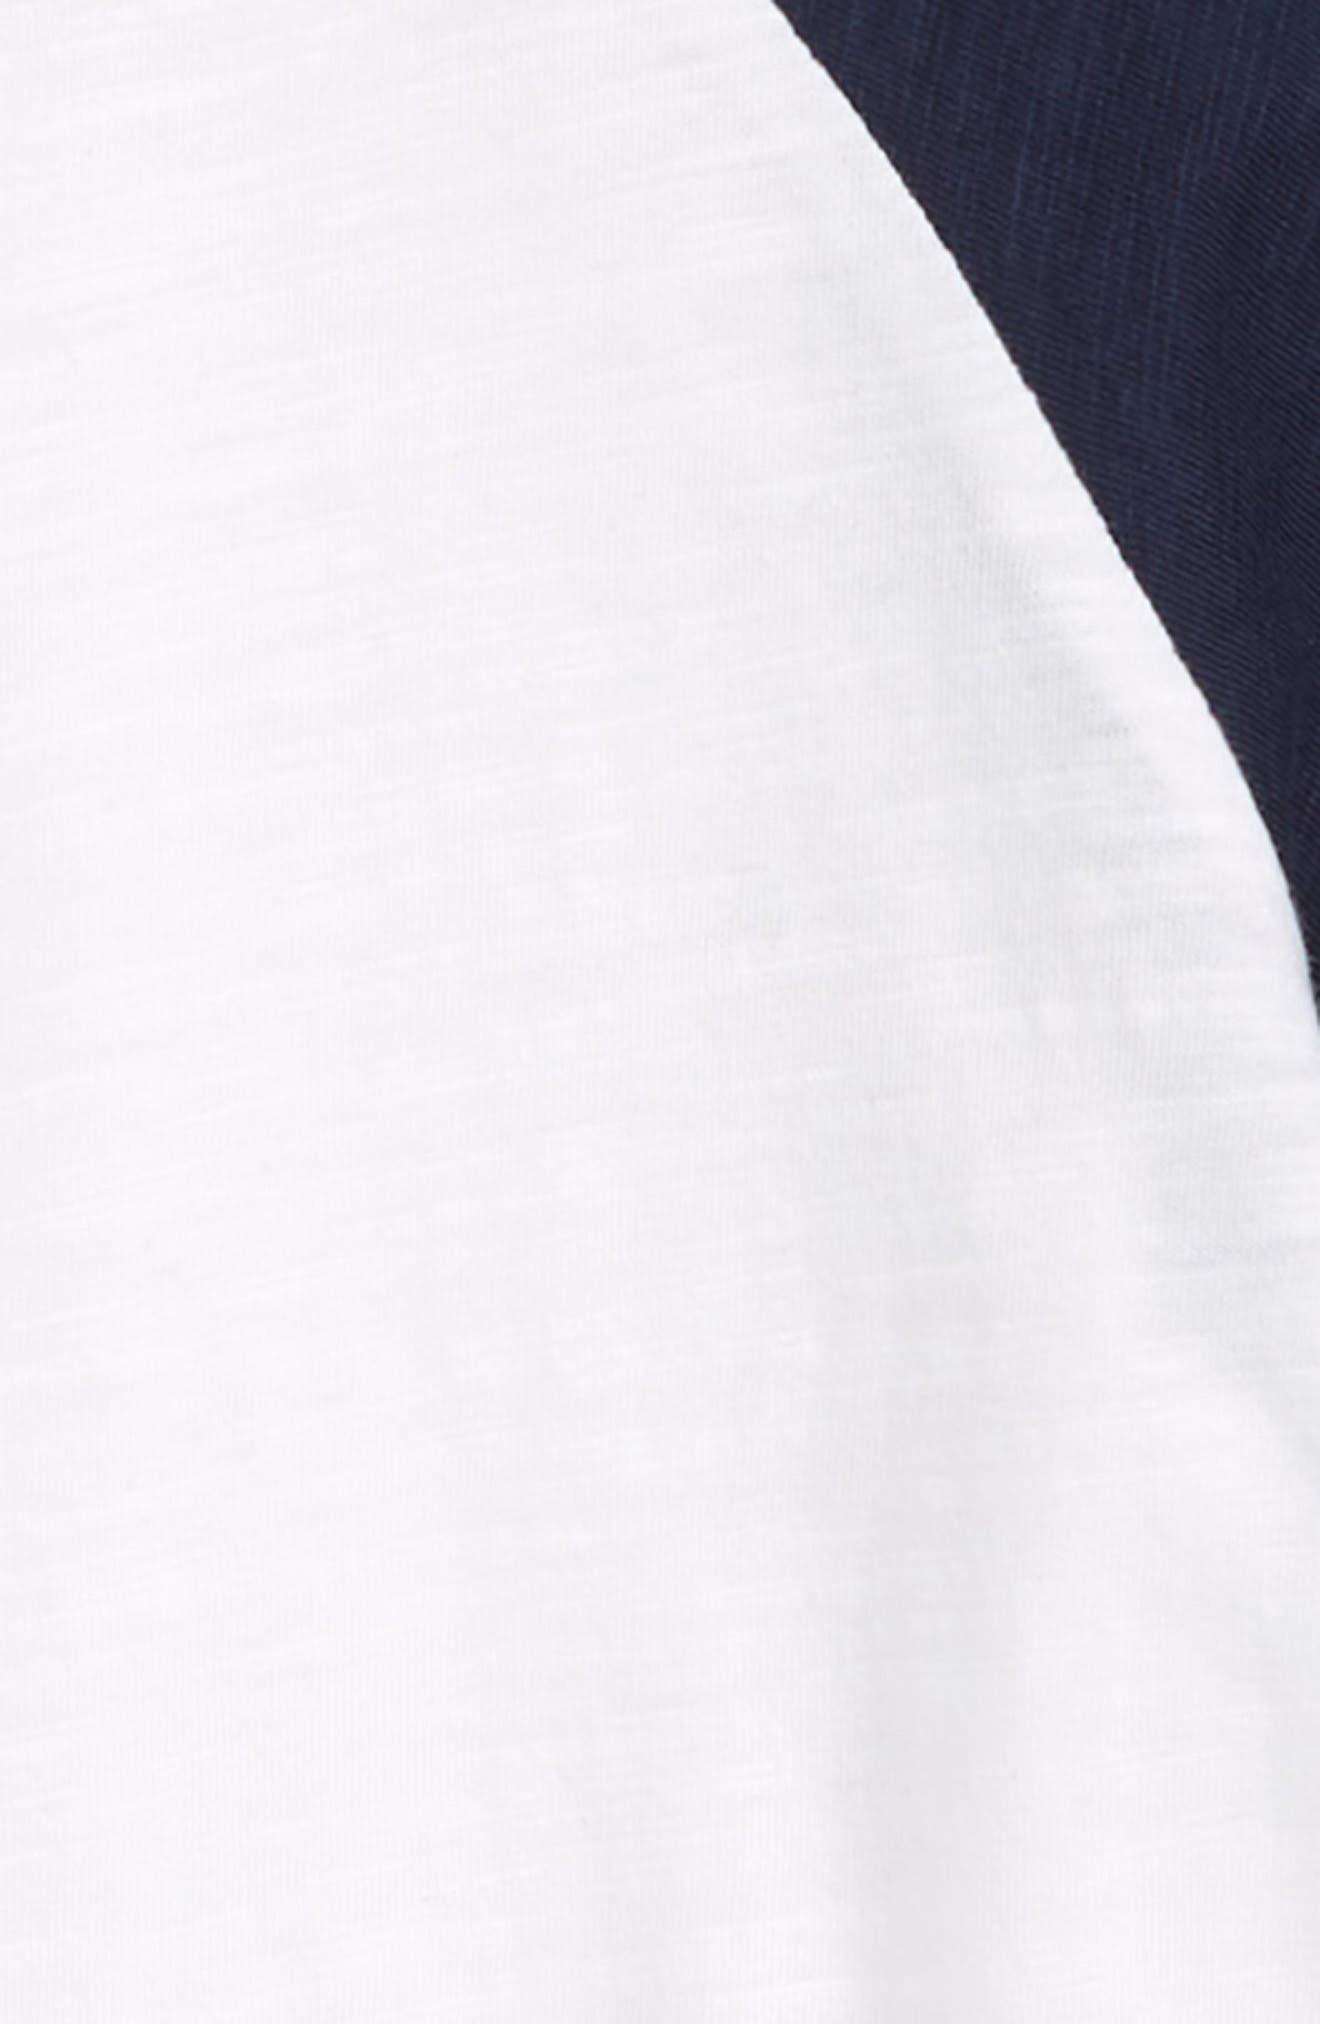 Little Slugger Organic Cotton T-Shirt,                             Alternate thumbnail 2, color,                             Navy/ White